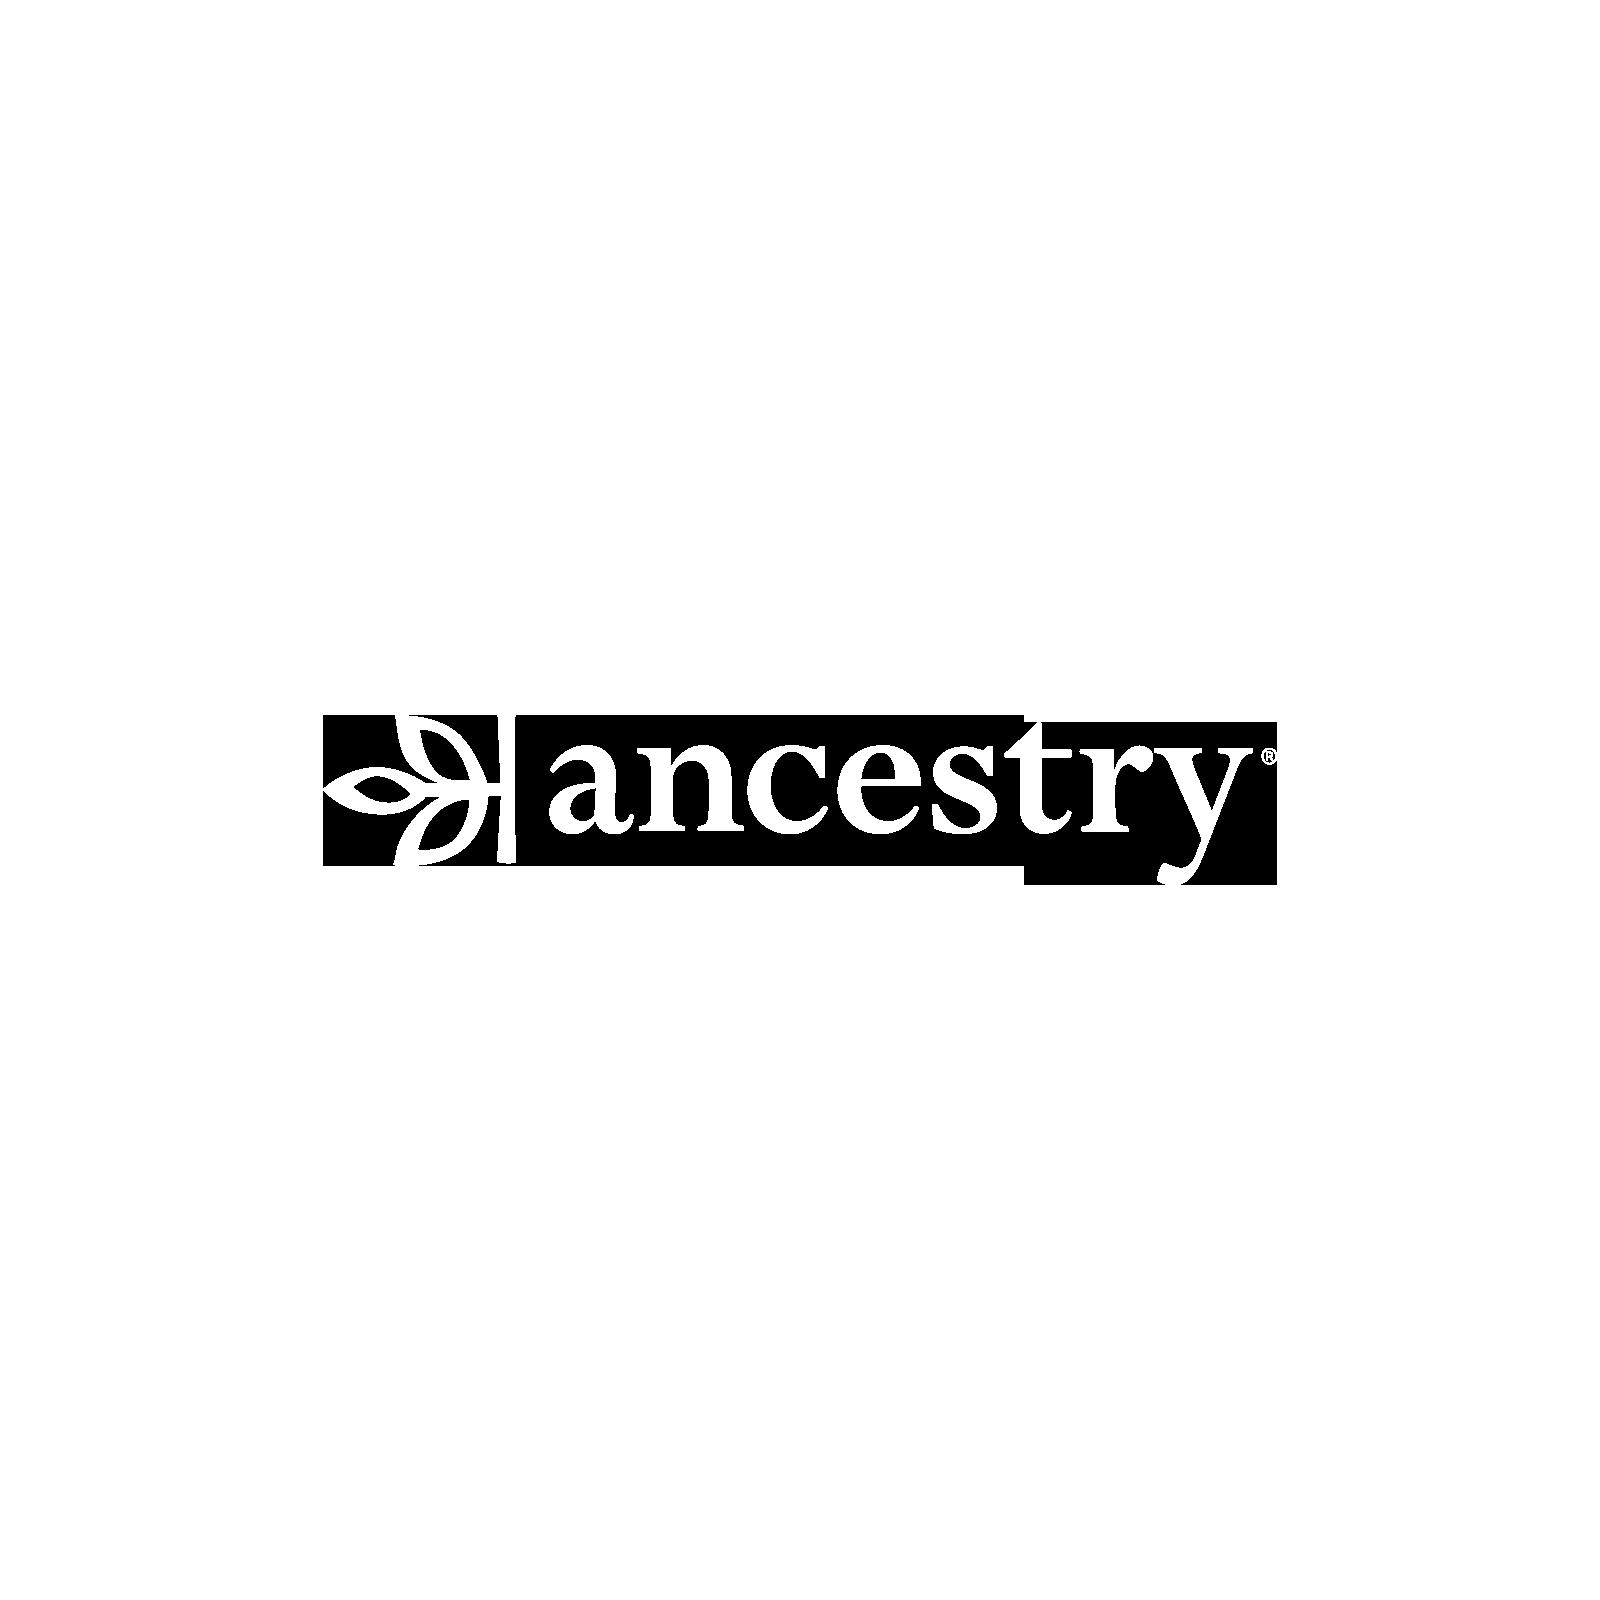 ancestry-project-logo